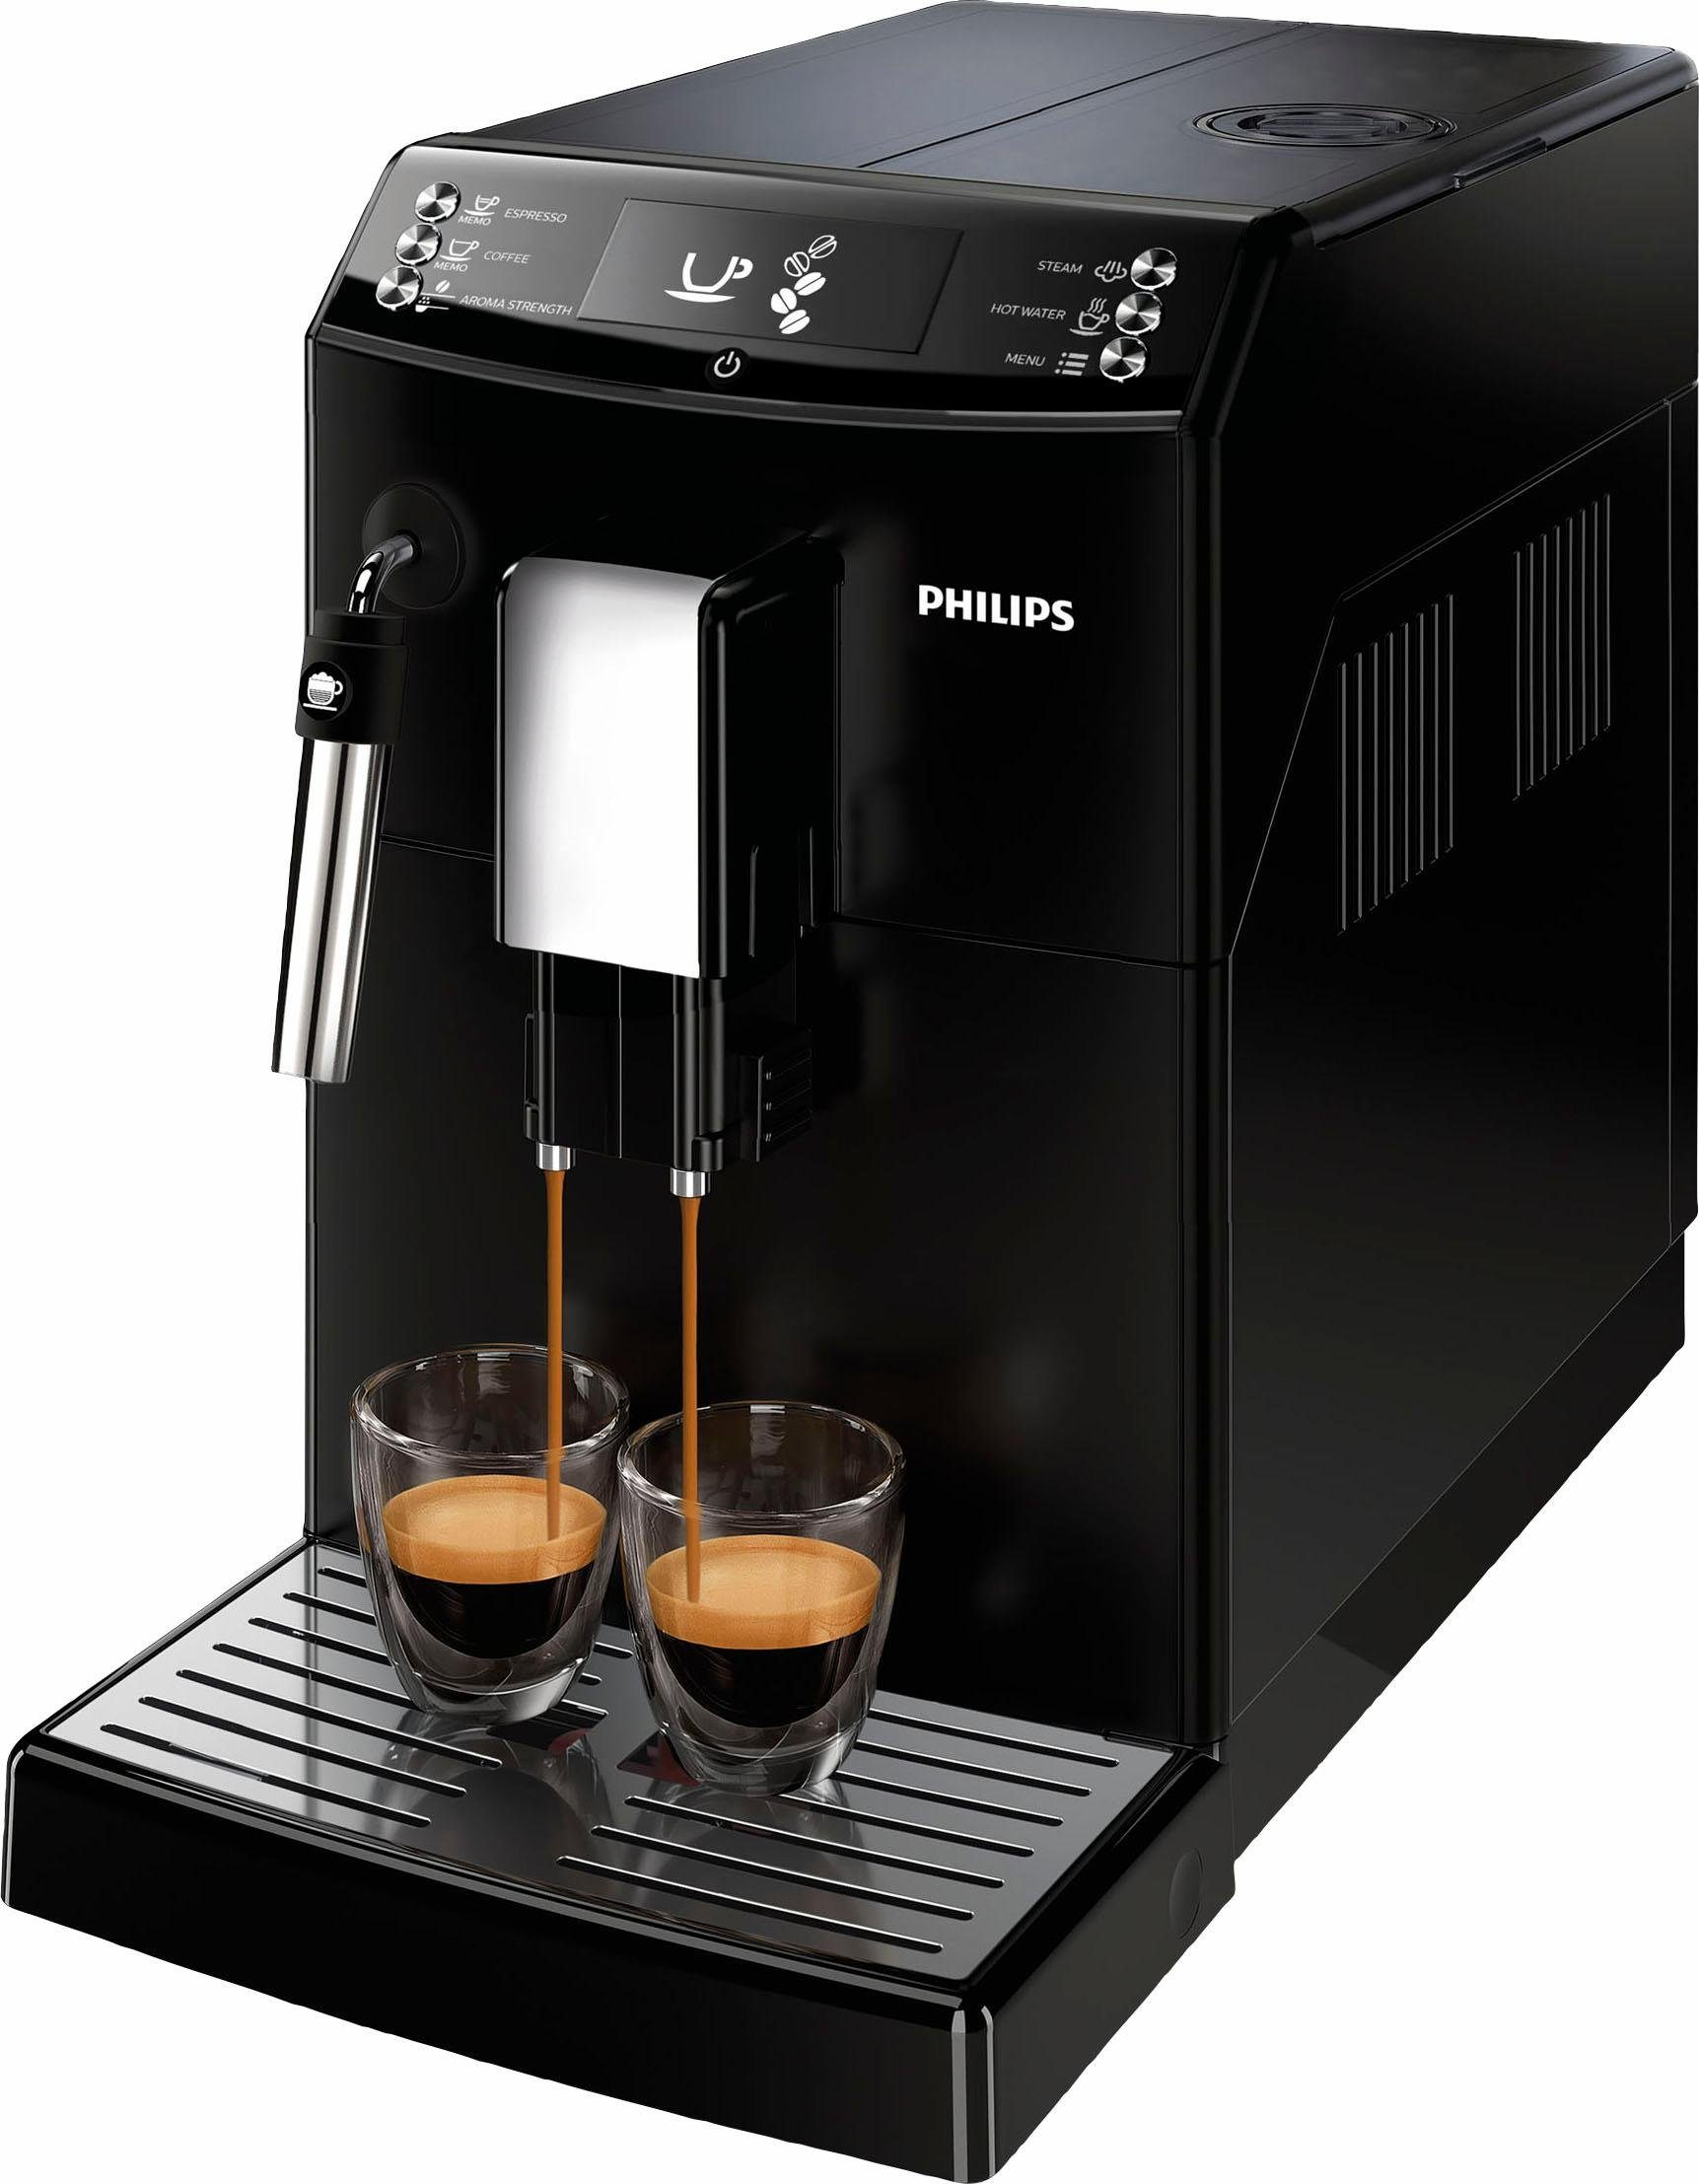 تصویر قهوه ساز اسپرسو philips (هلند) EP3510/00